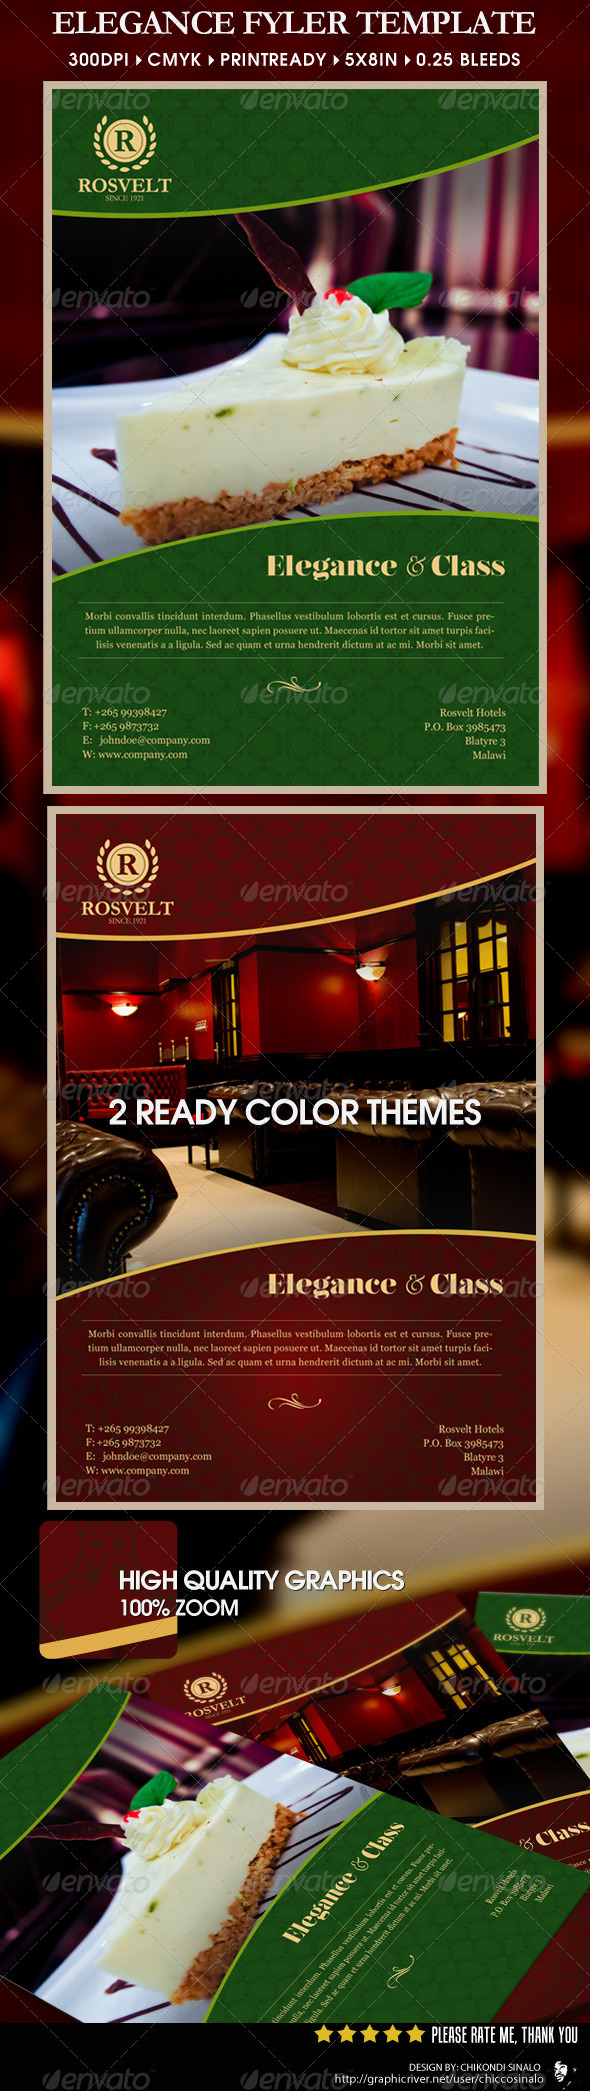 Elegance Flyer Template - Restaurant Flyers